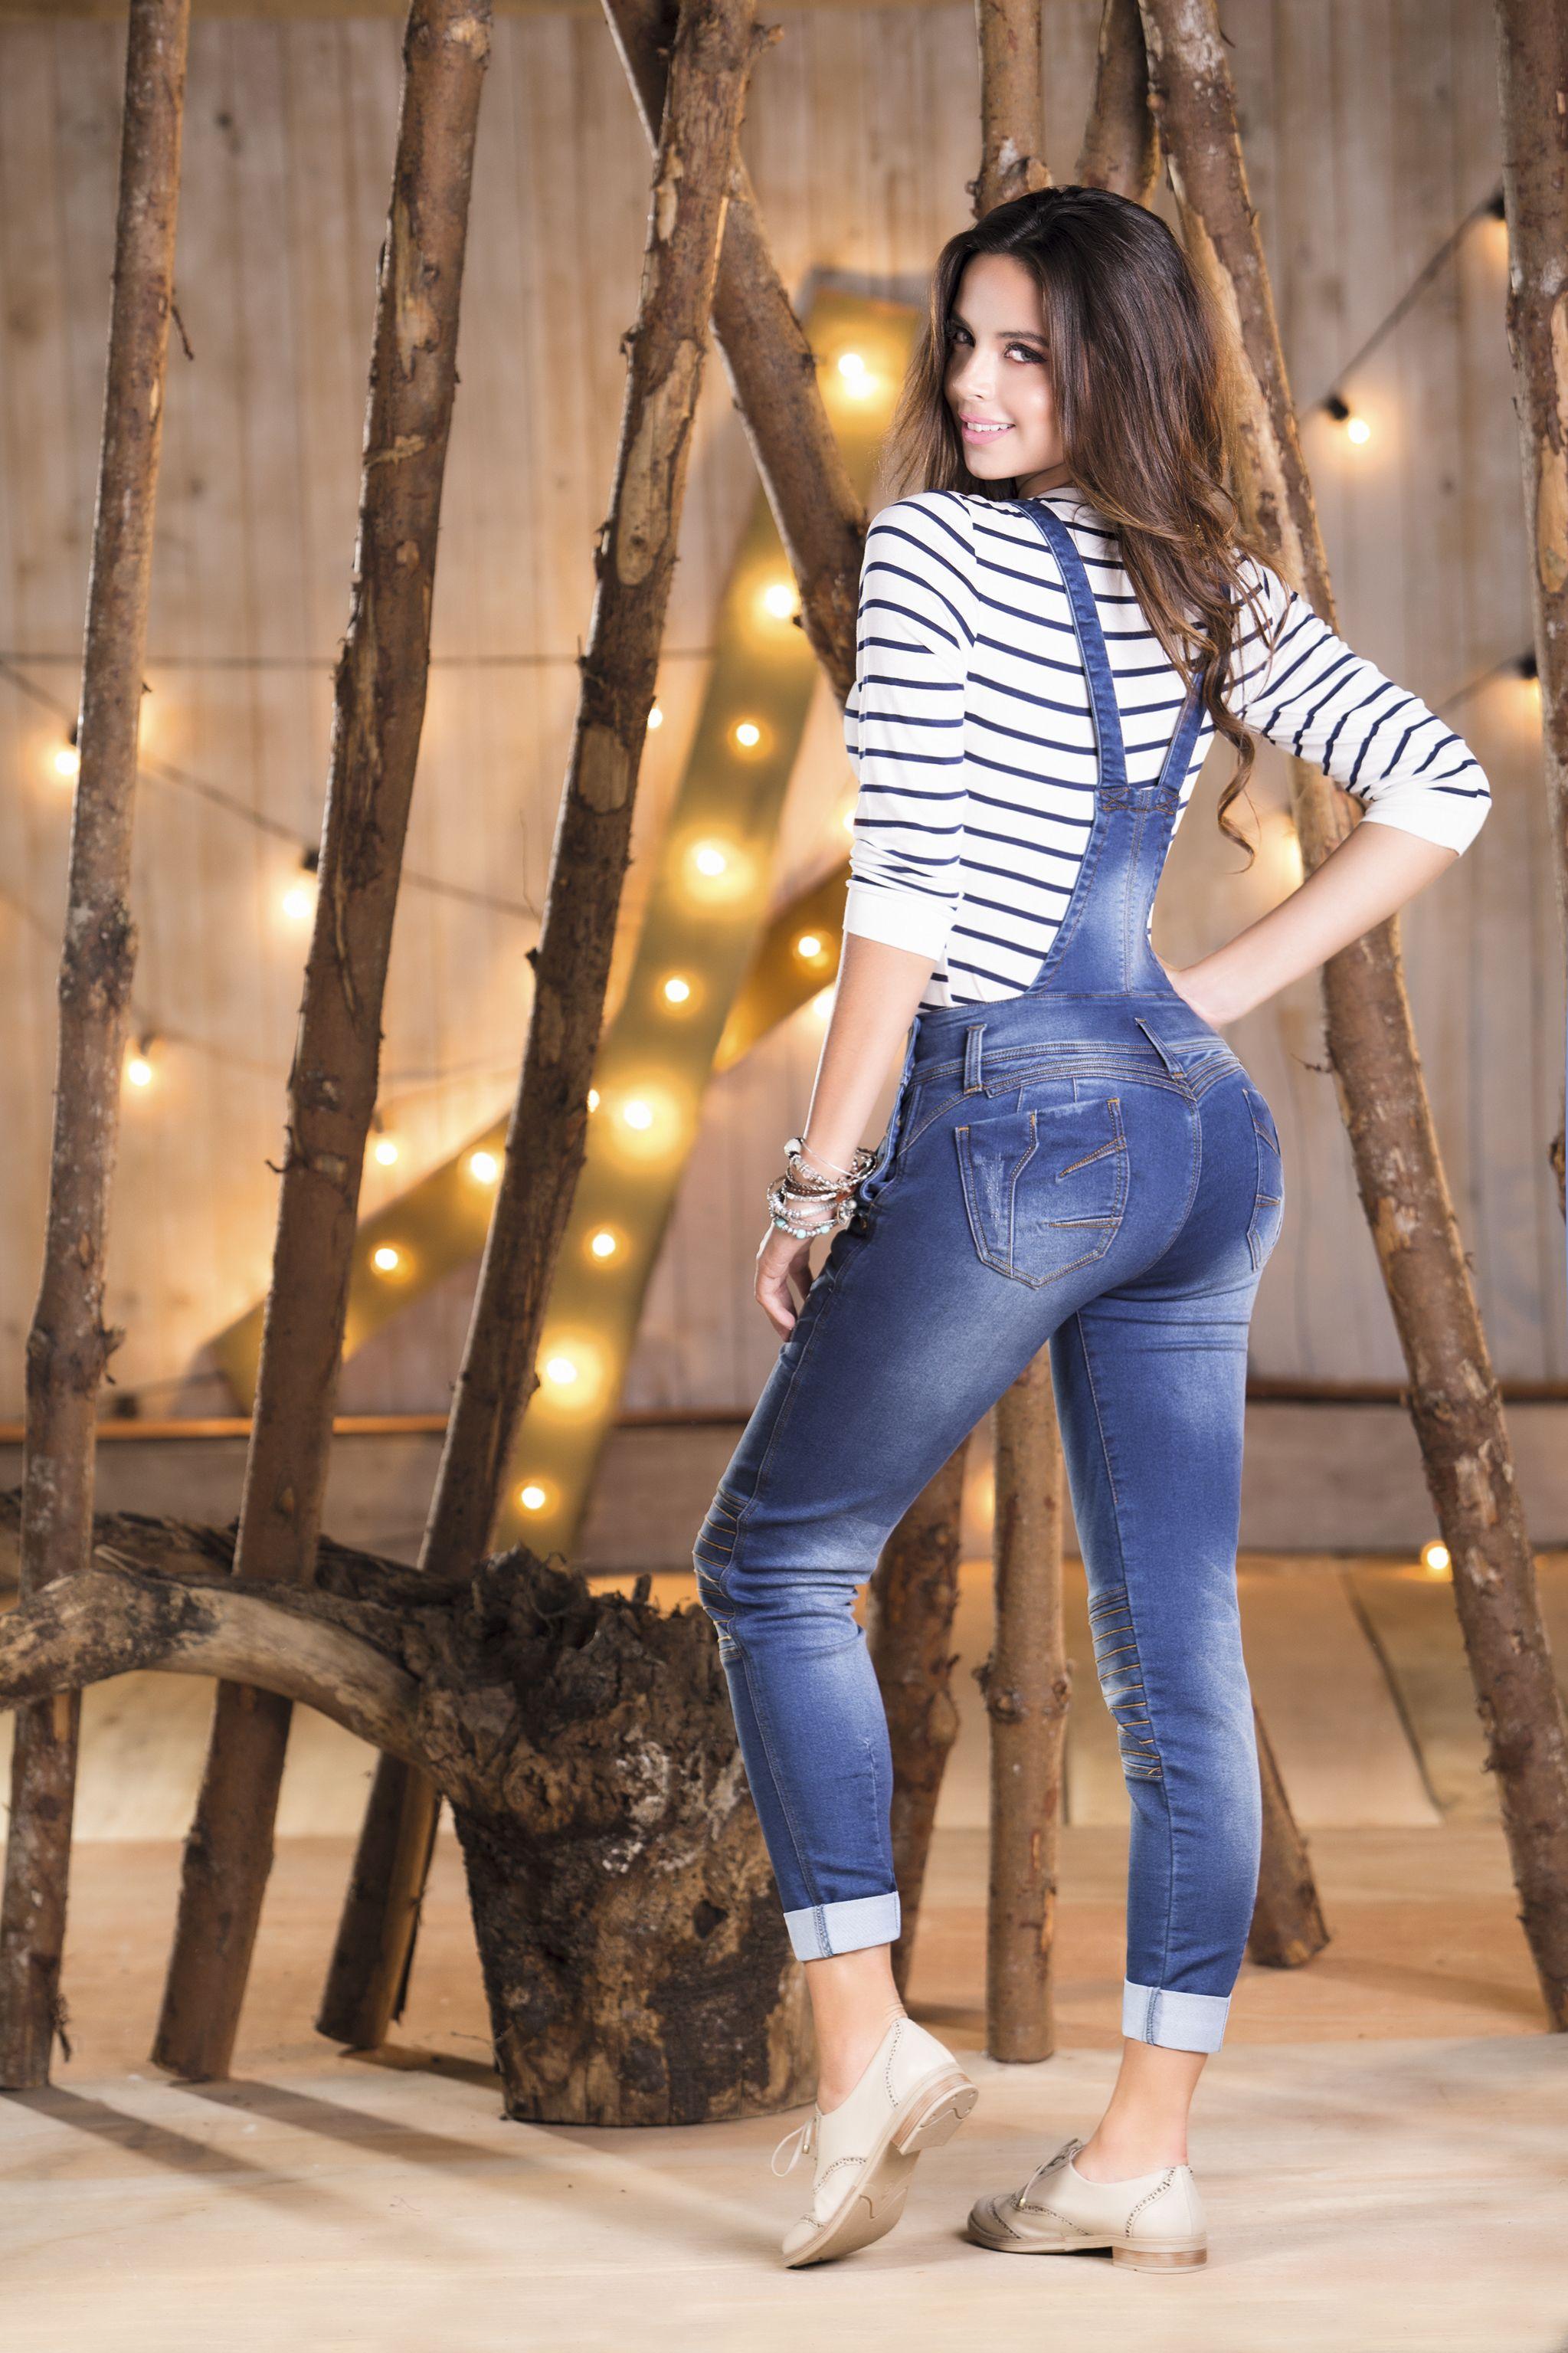 Luce una espectacular braga en jens. Resalta tu figura y tus curvas   yovistotyt  jeanstyt 8711047ed564